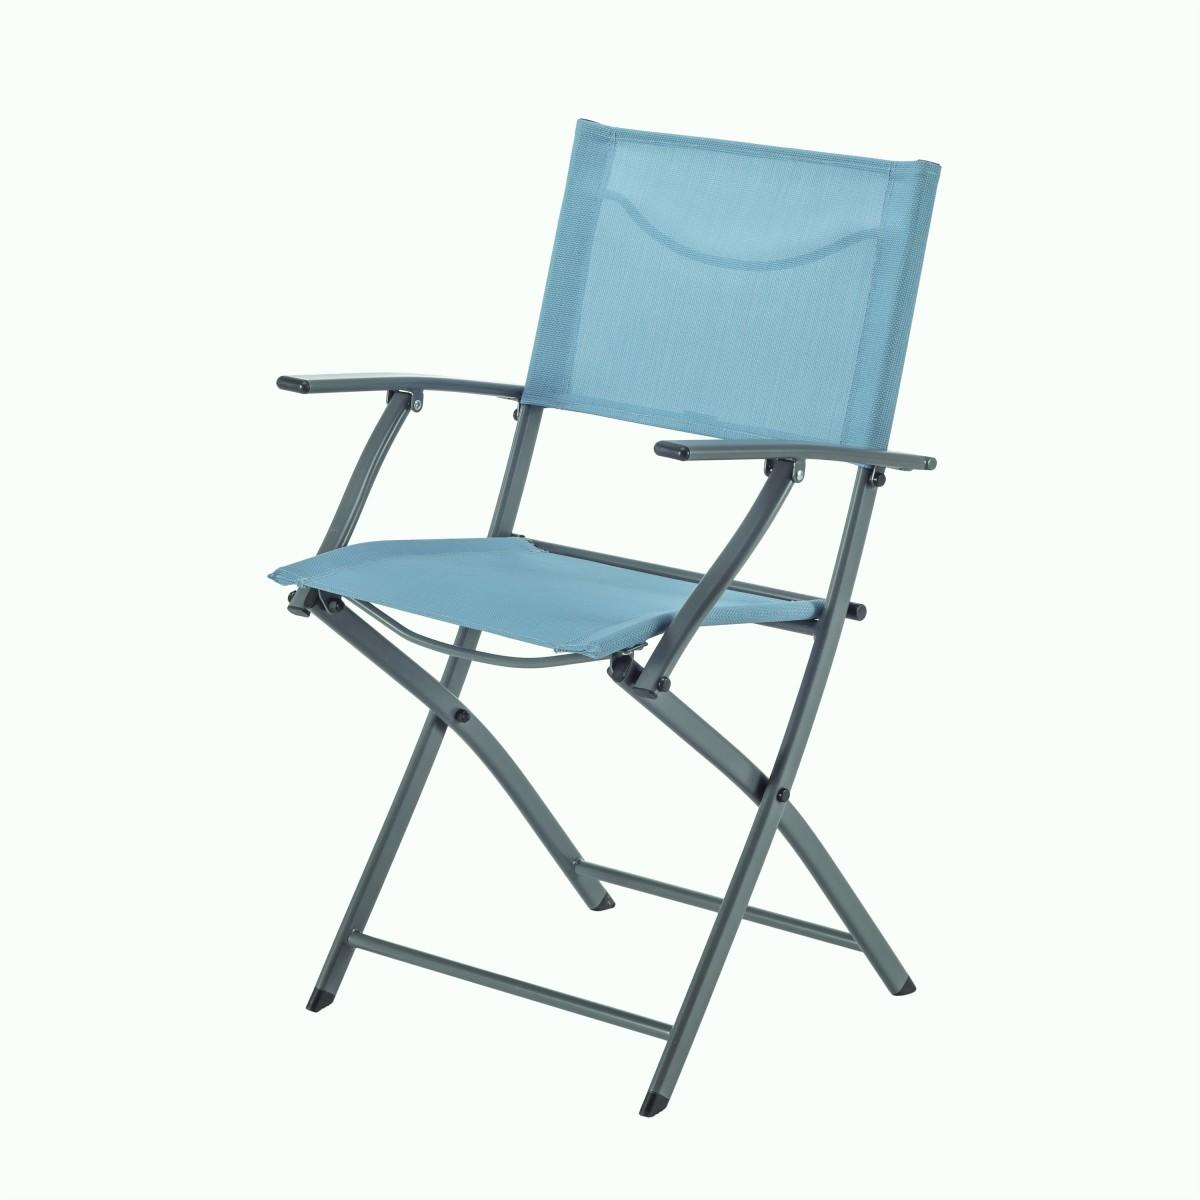 Кресло Naterial Emys Origami складное 54х52х83 см сталь голубой